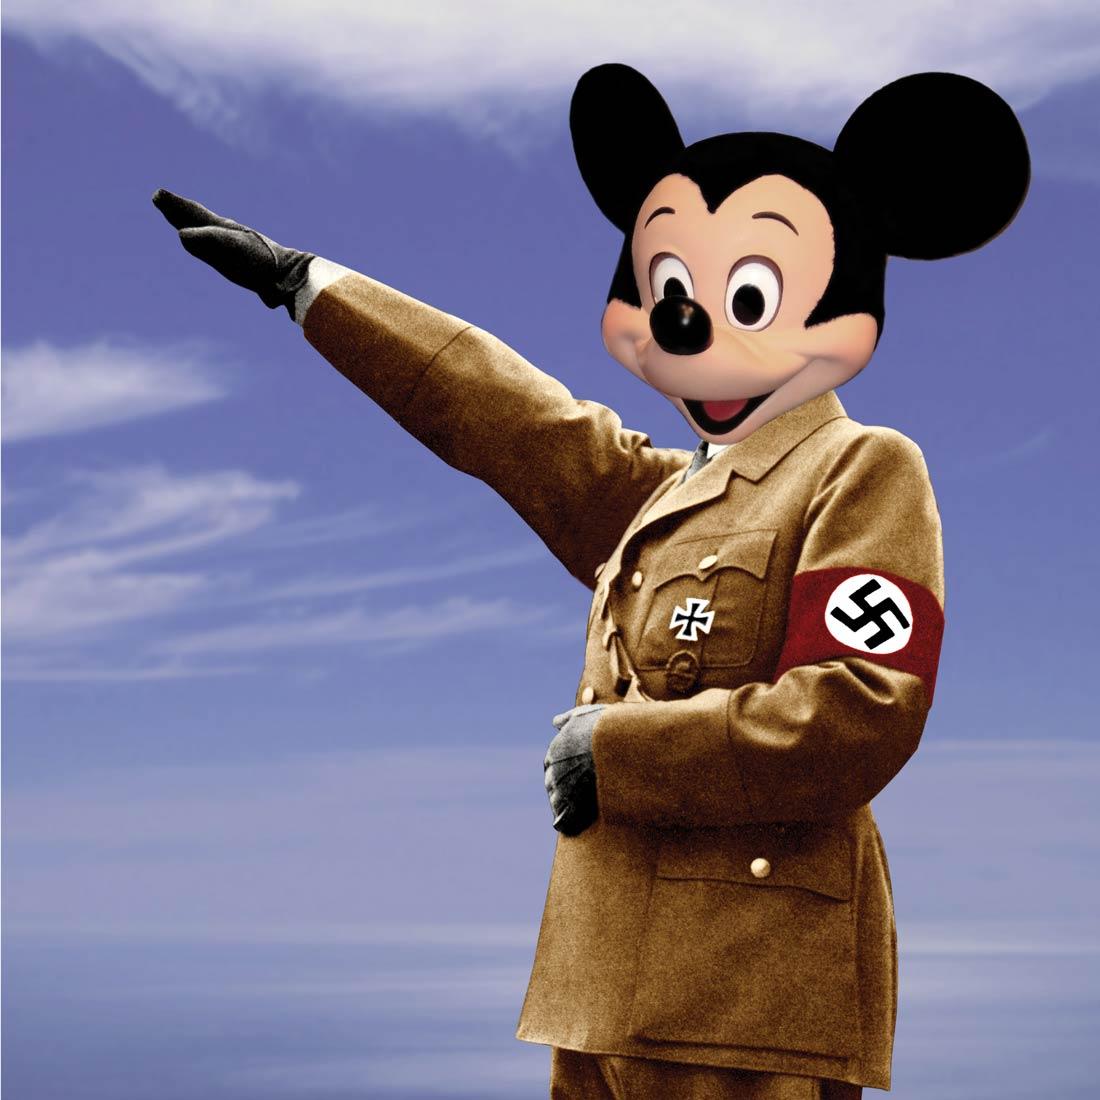 Nazi Fucking Mouse - Max Papeschi